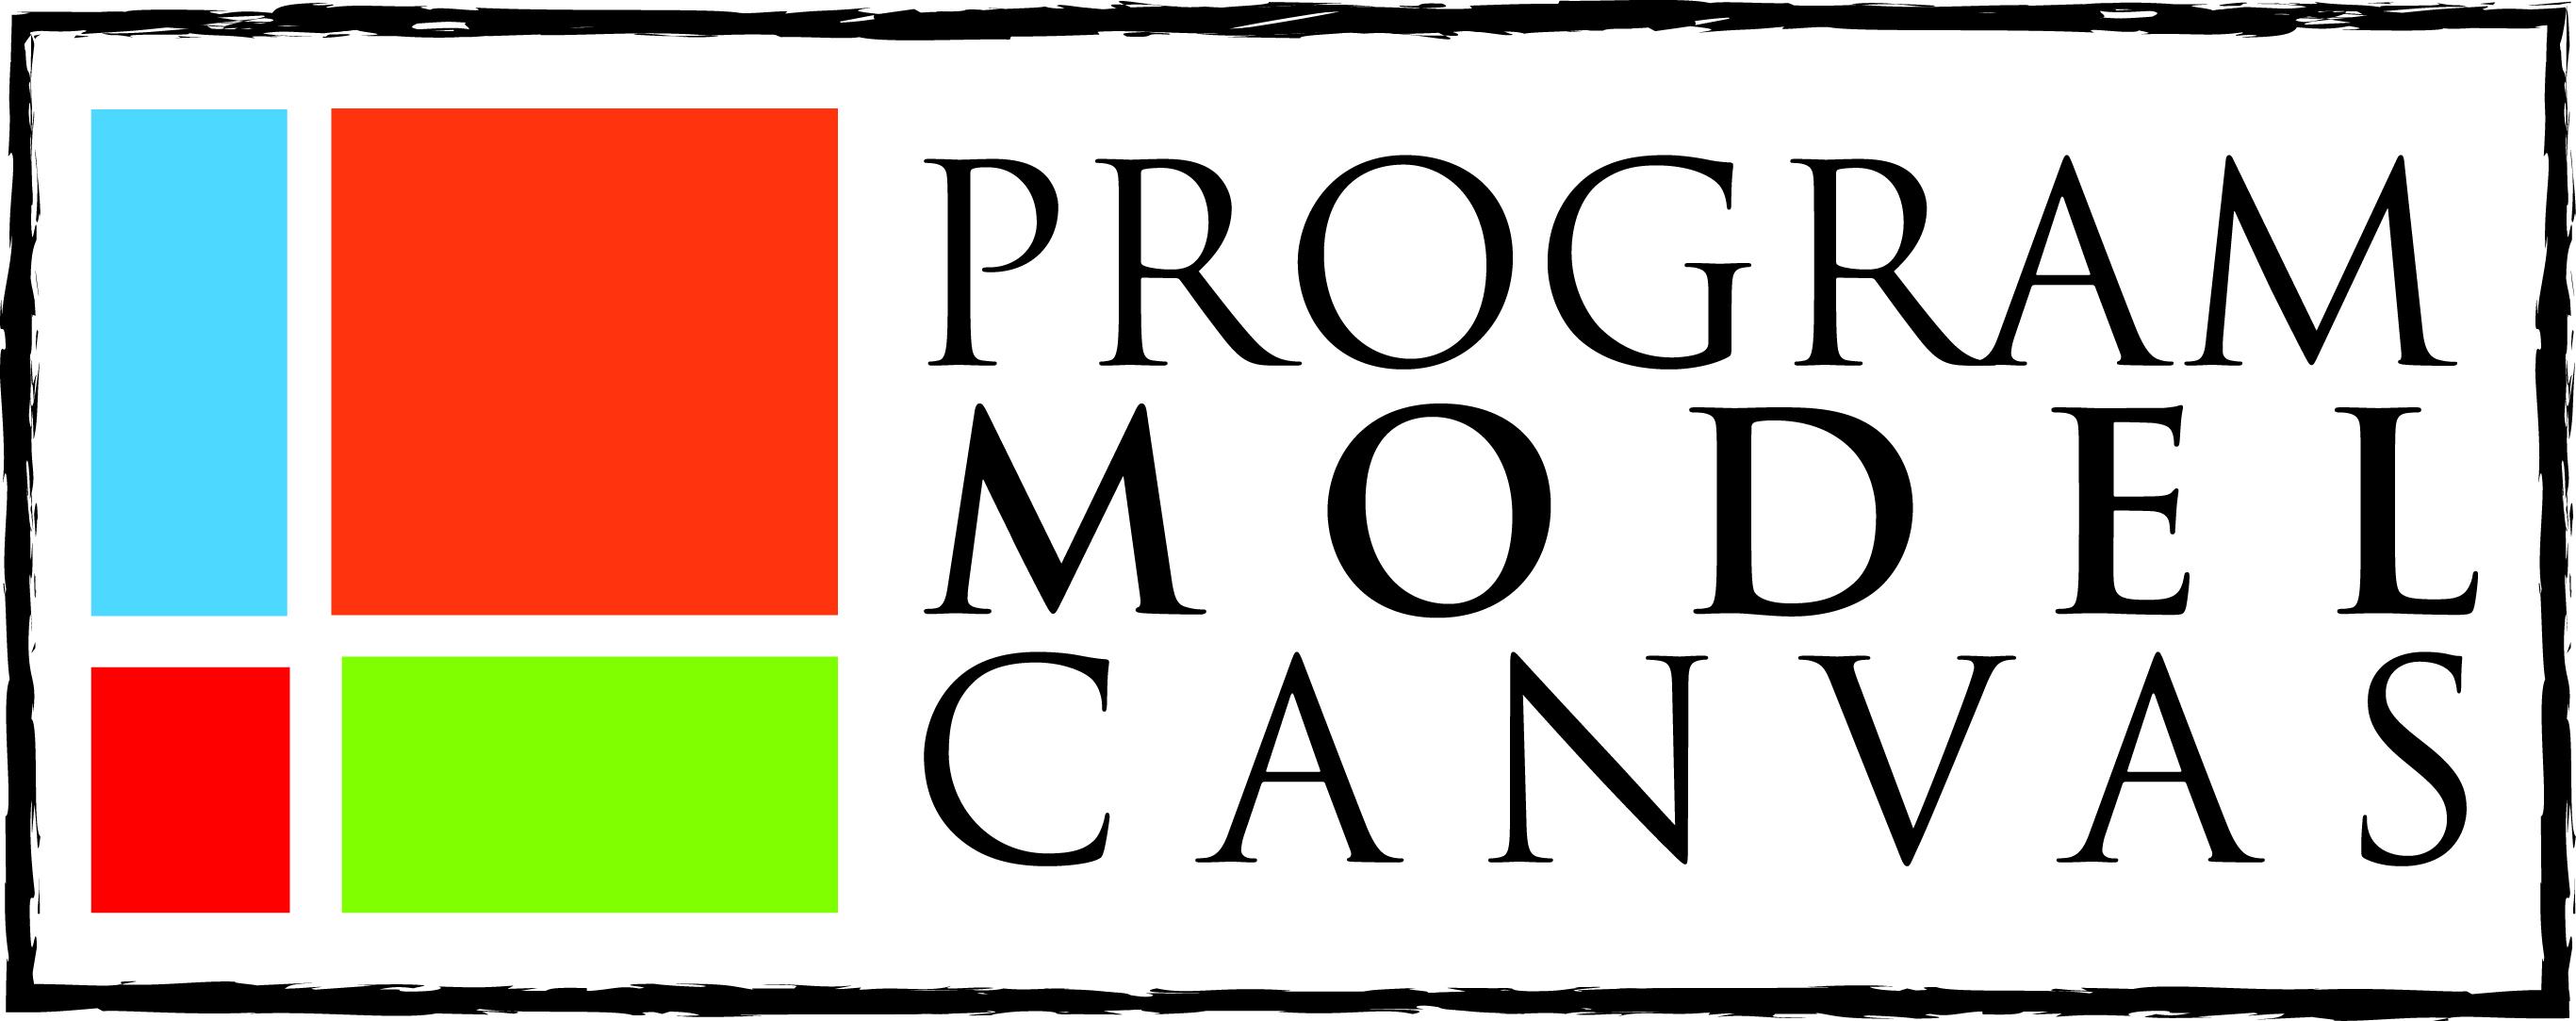 Program Model Canvas